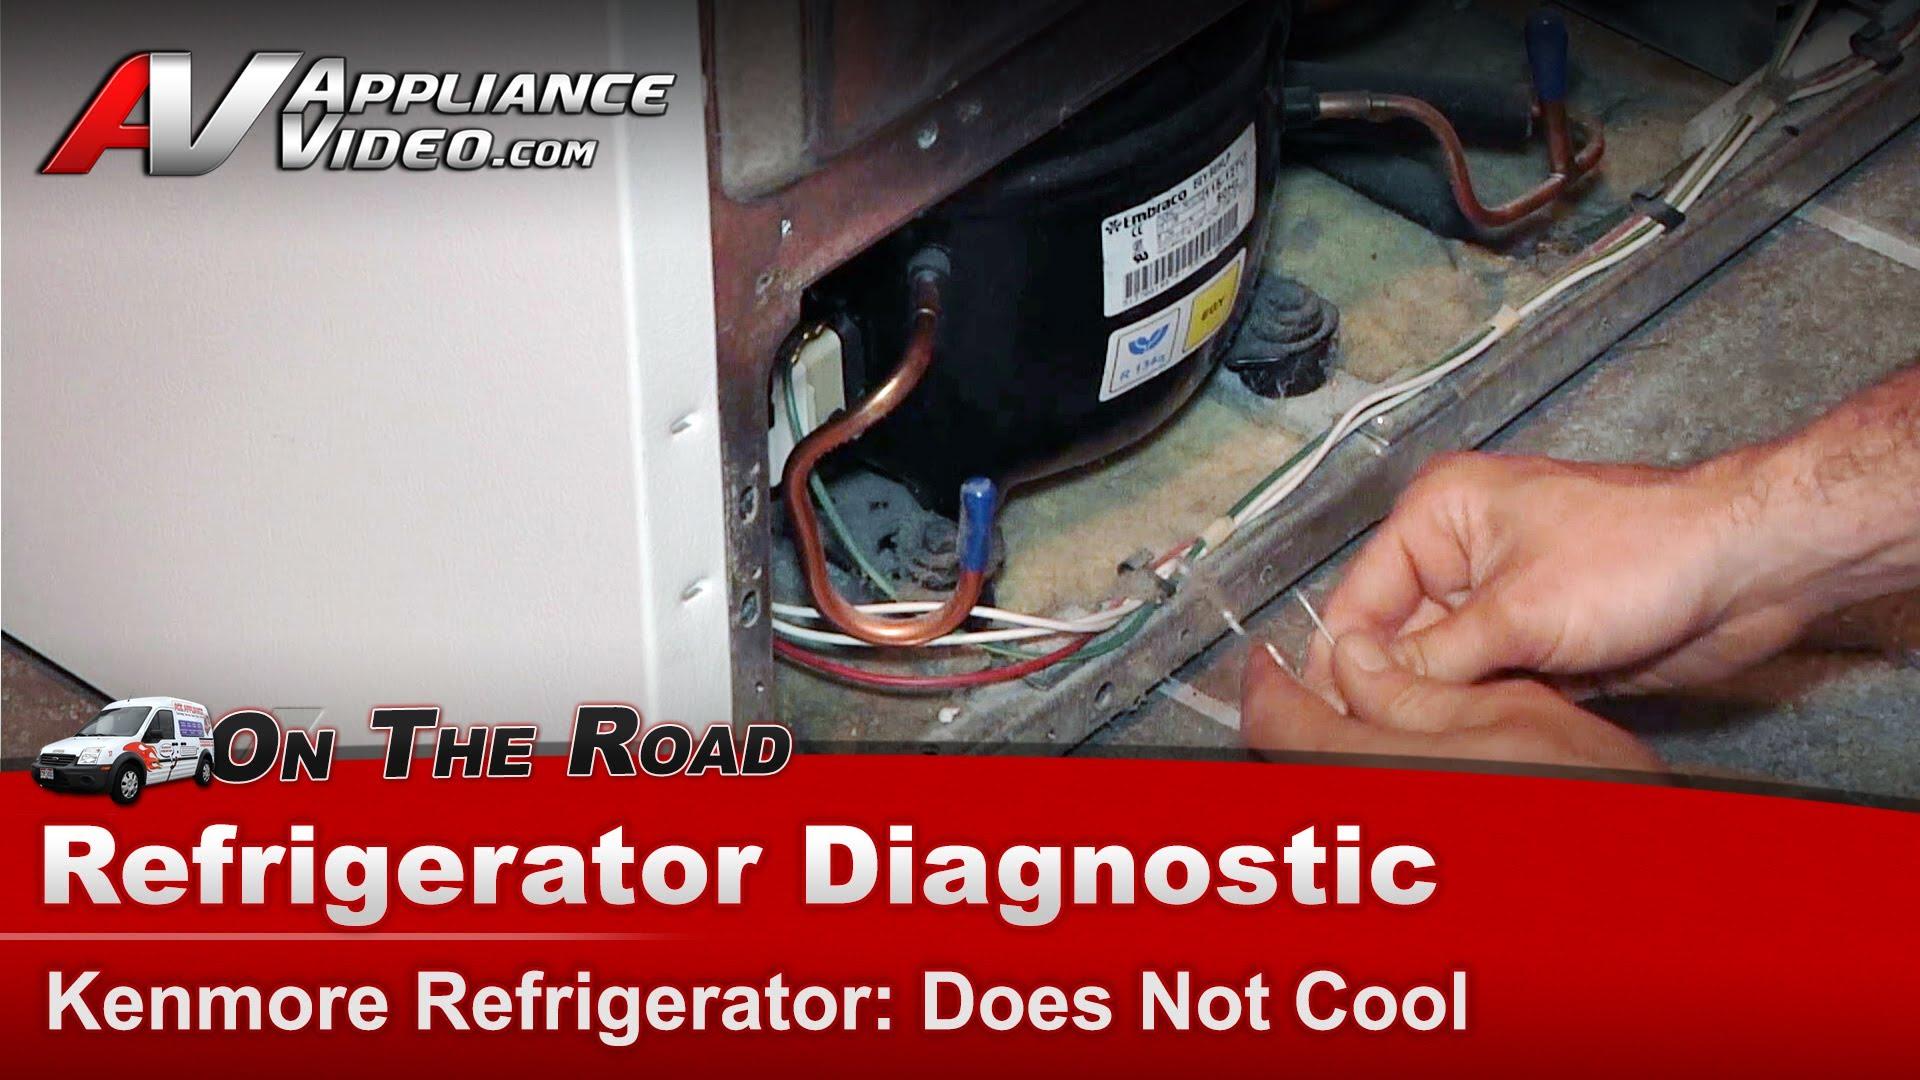 Ge Refrigerators Wiring Diagram Kenmore 10653632300 Refrigerator Diagnostic Does Not